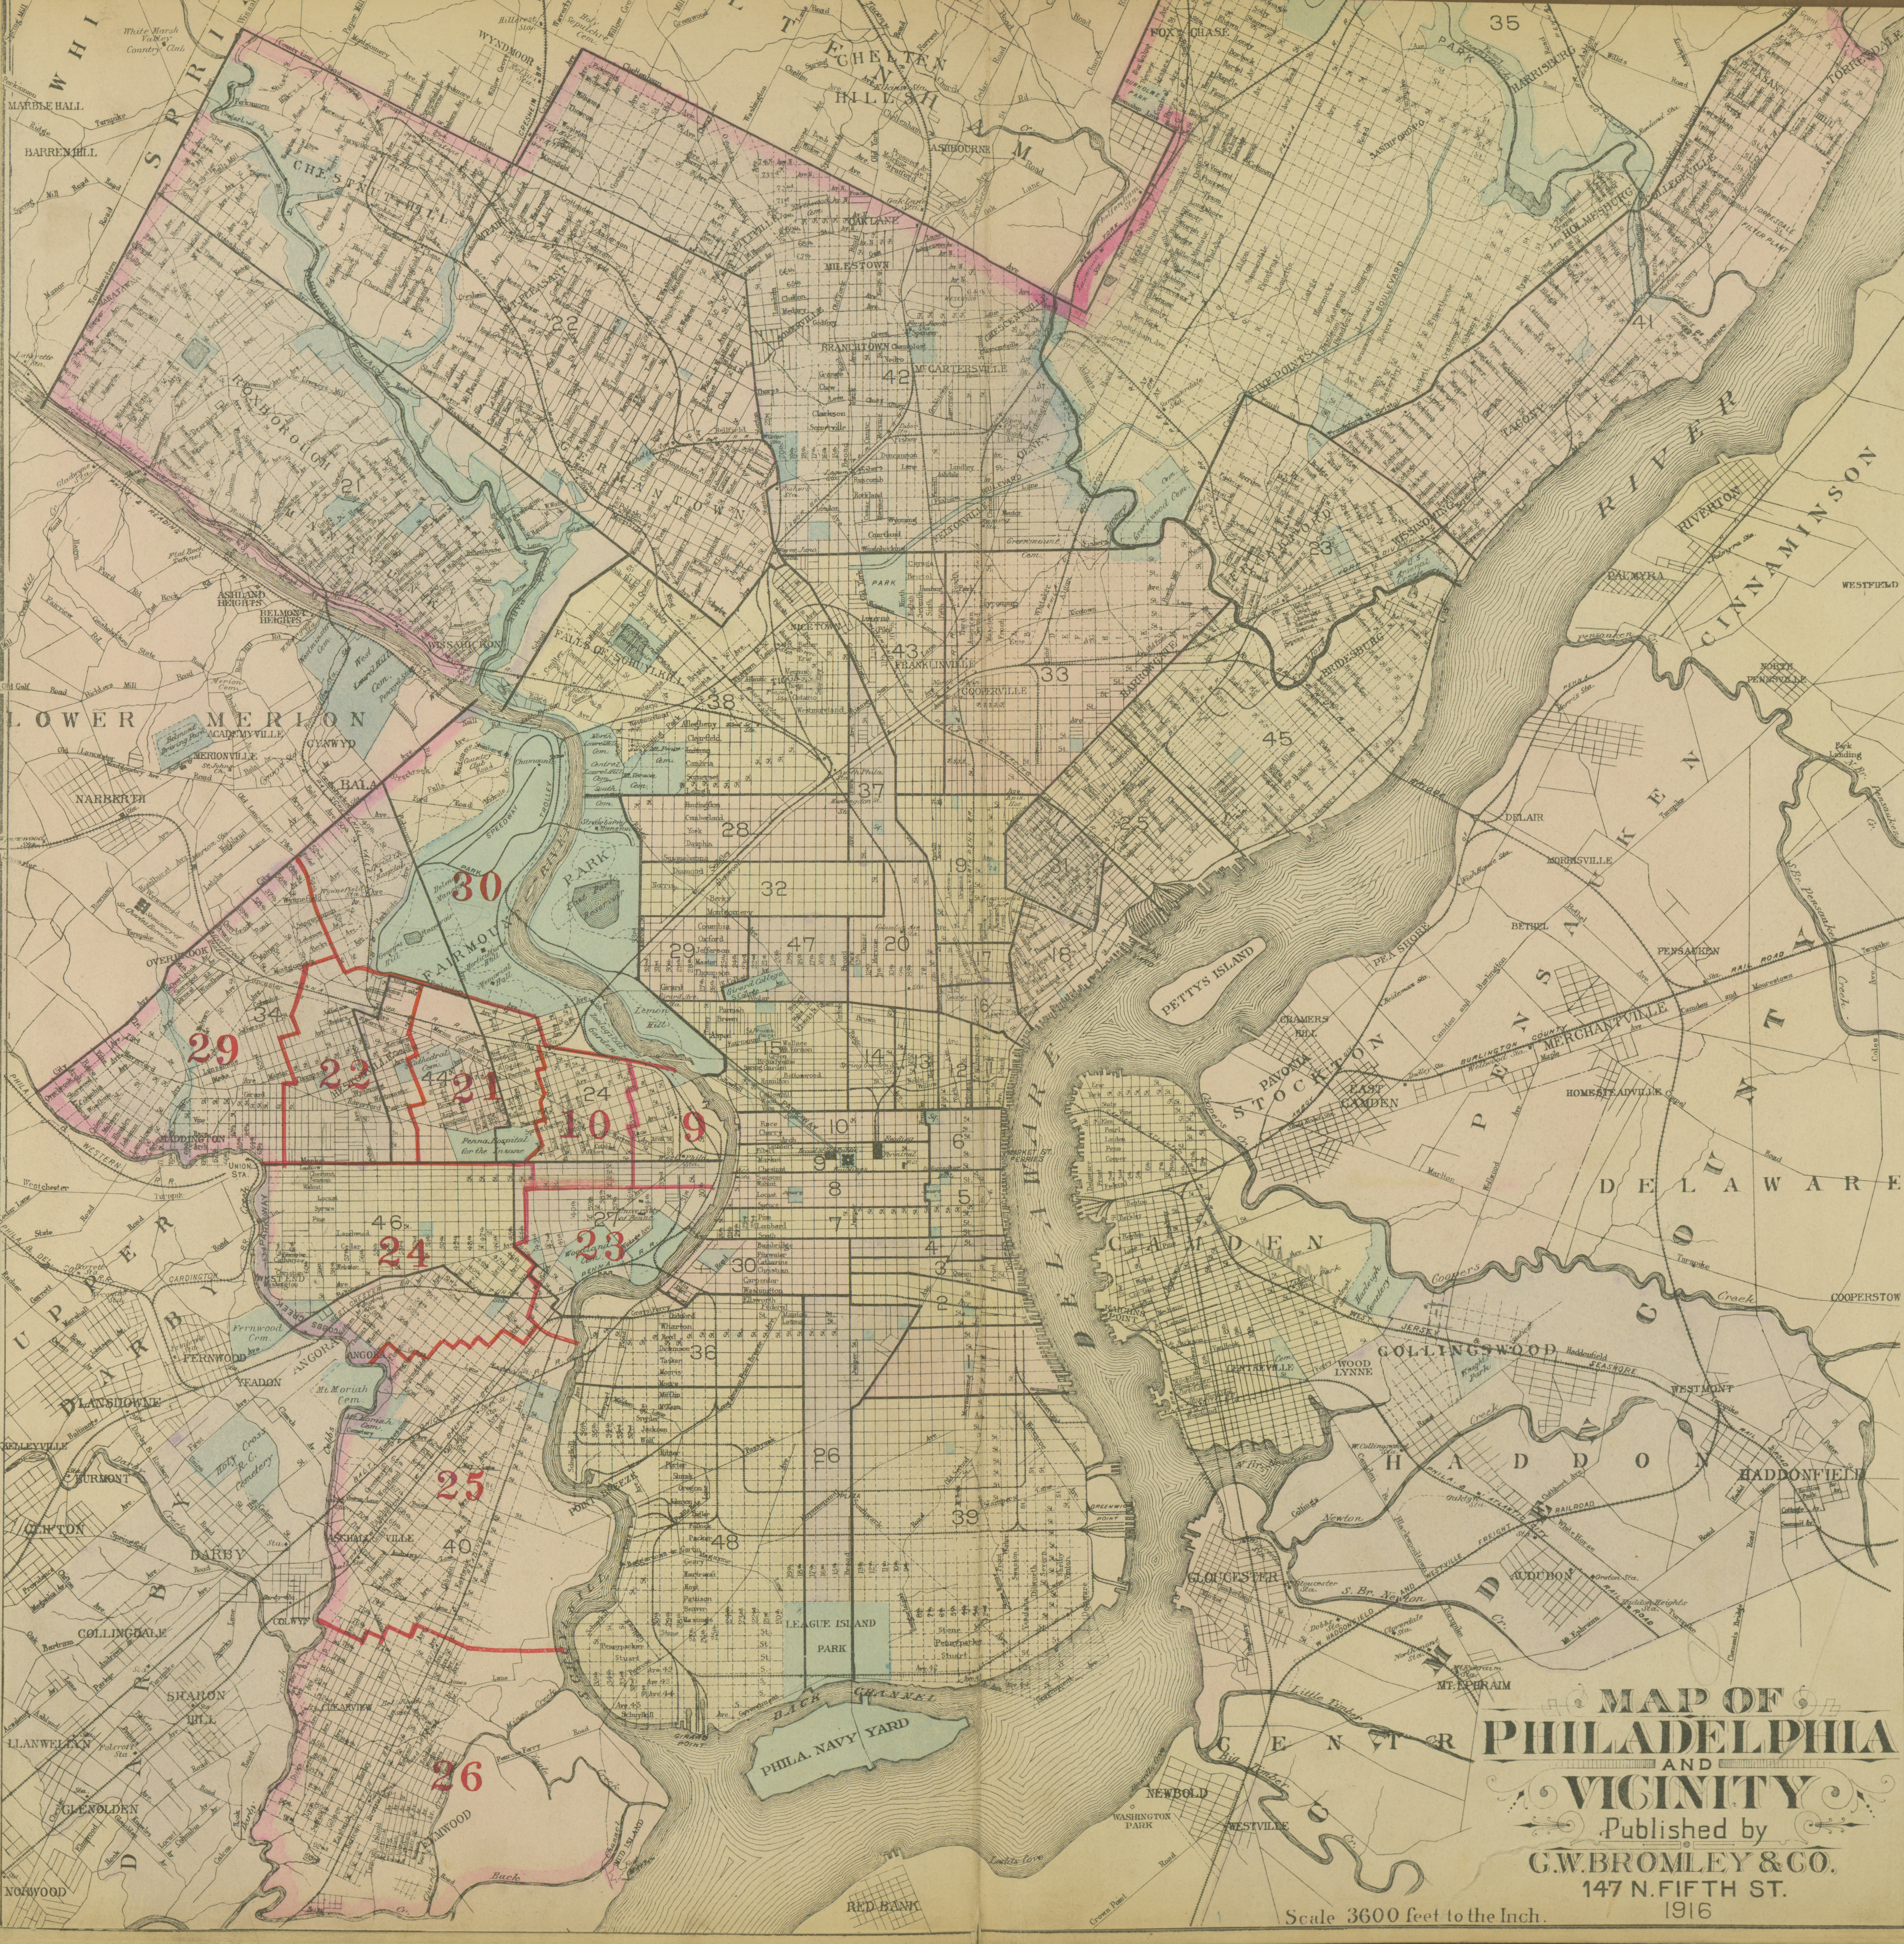 1916 Atlas of Philadelphia (West Philadelphia) - Index Map